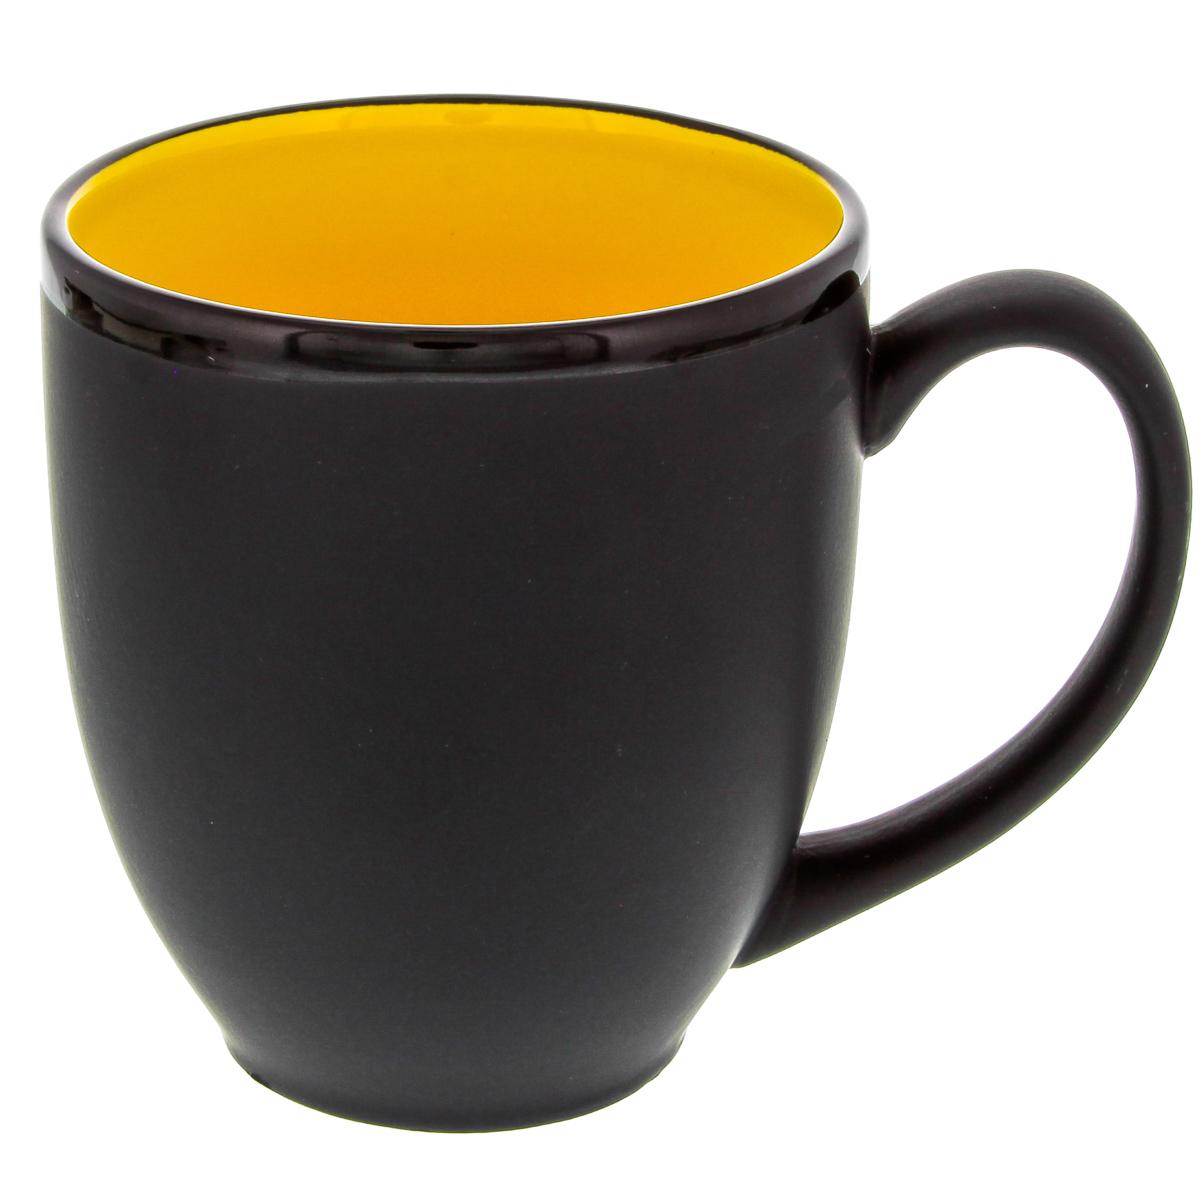 Hilo Bistro Coffee Mug Ceramic Yellow Matte Black Cafe ...